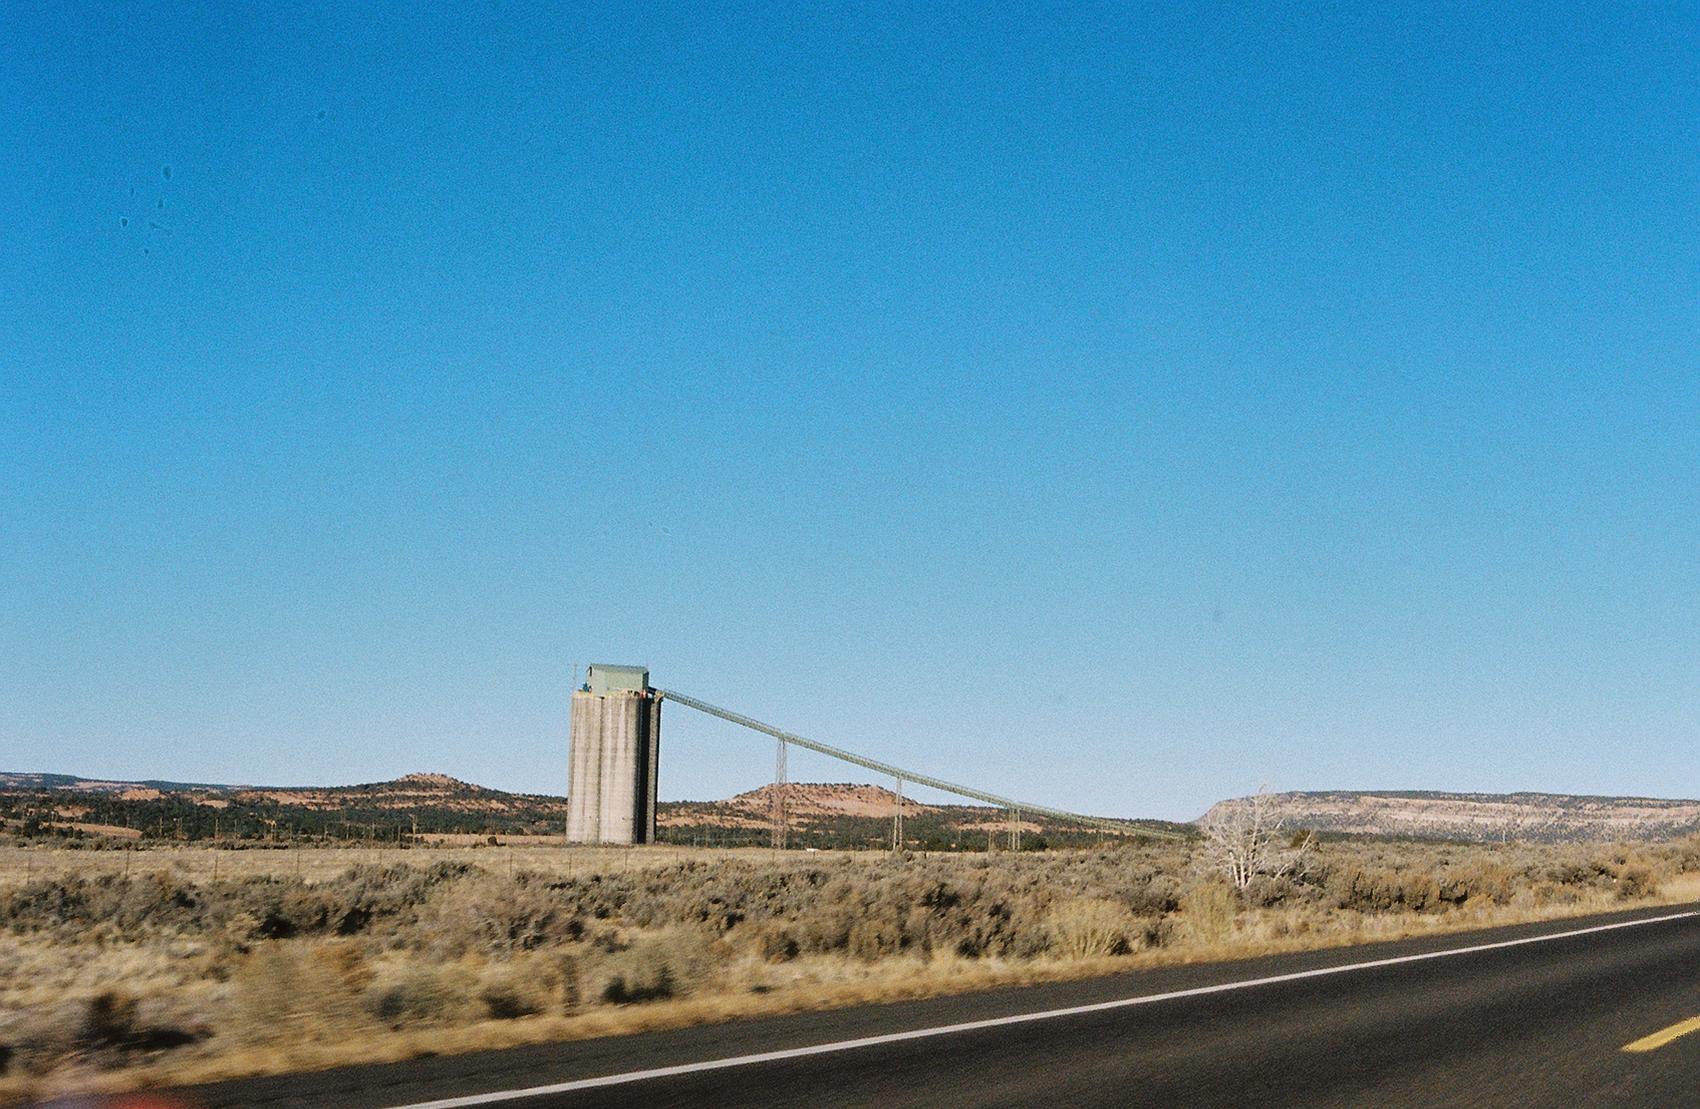 VanessaBlack_BLKFLM_35mm_America_#SEEYOURCOUNTRY70196R3-R01-018.Jpg